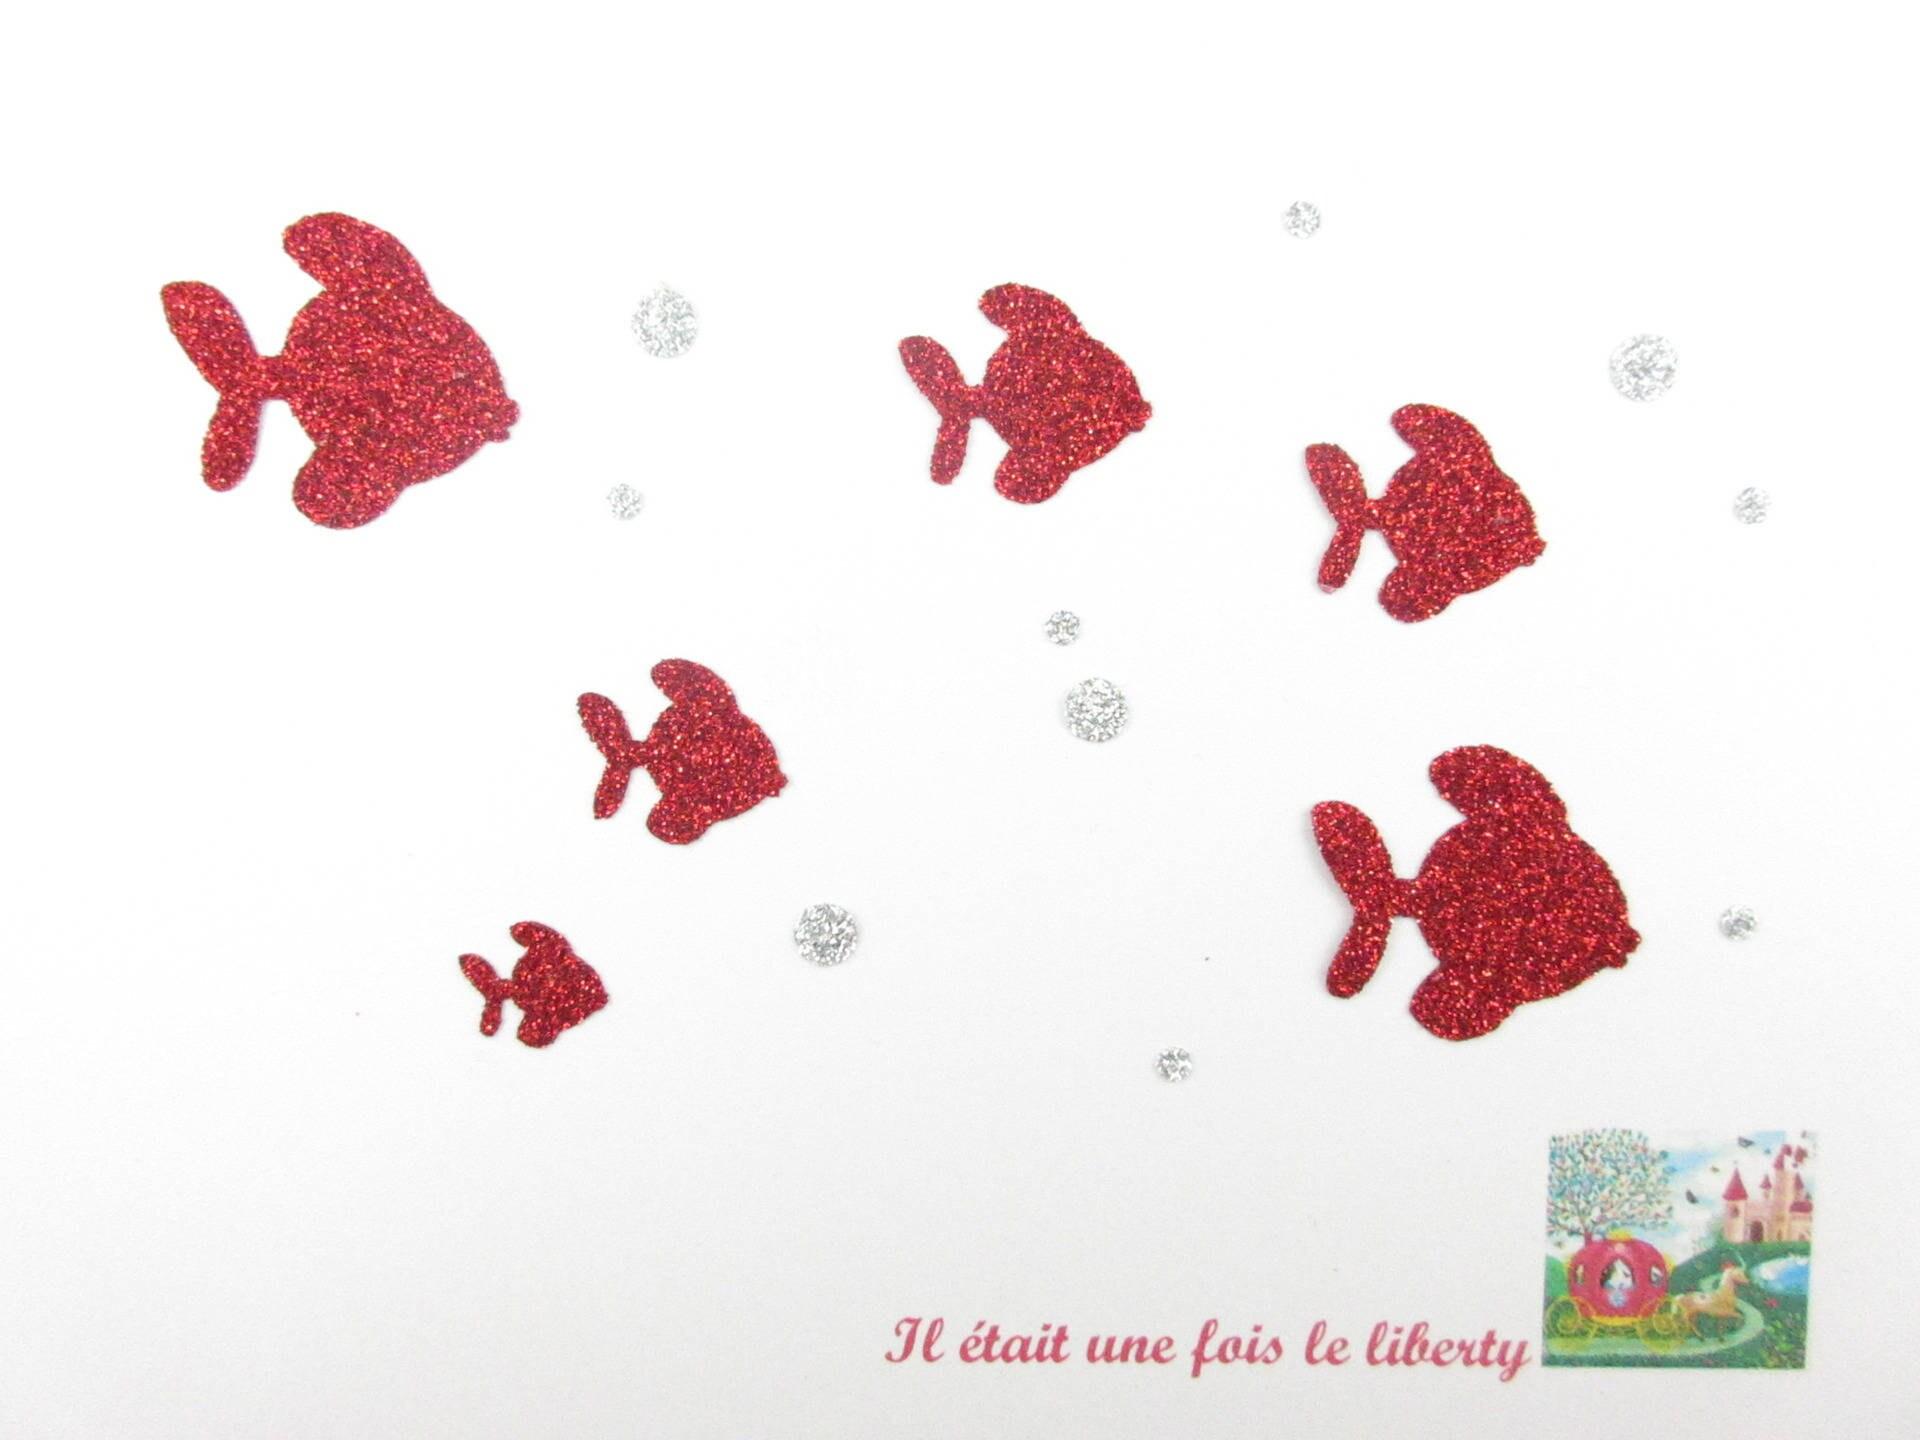 Patch repasser appliqu s thermocollants poissons en tissu paillet rouge argent motifs - Transfert tissu fer a repasser ...